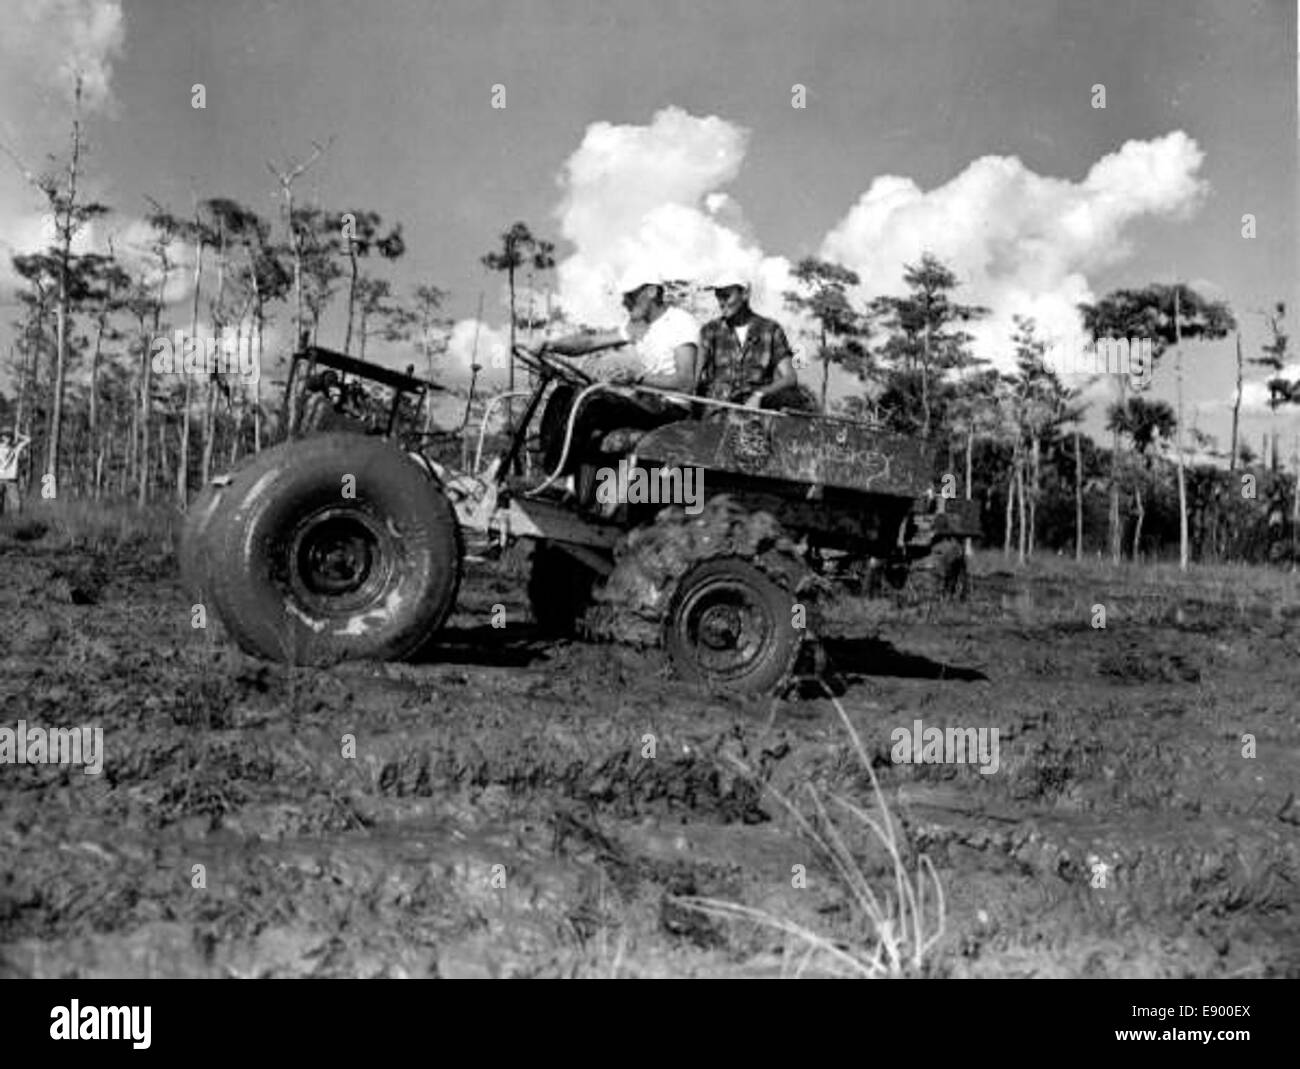 Swamp buggy races - Naples 15167737460 o - Stock Image